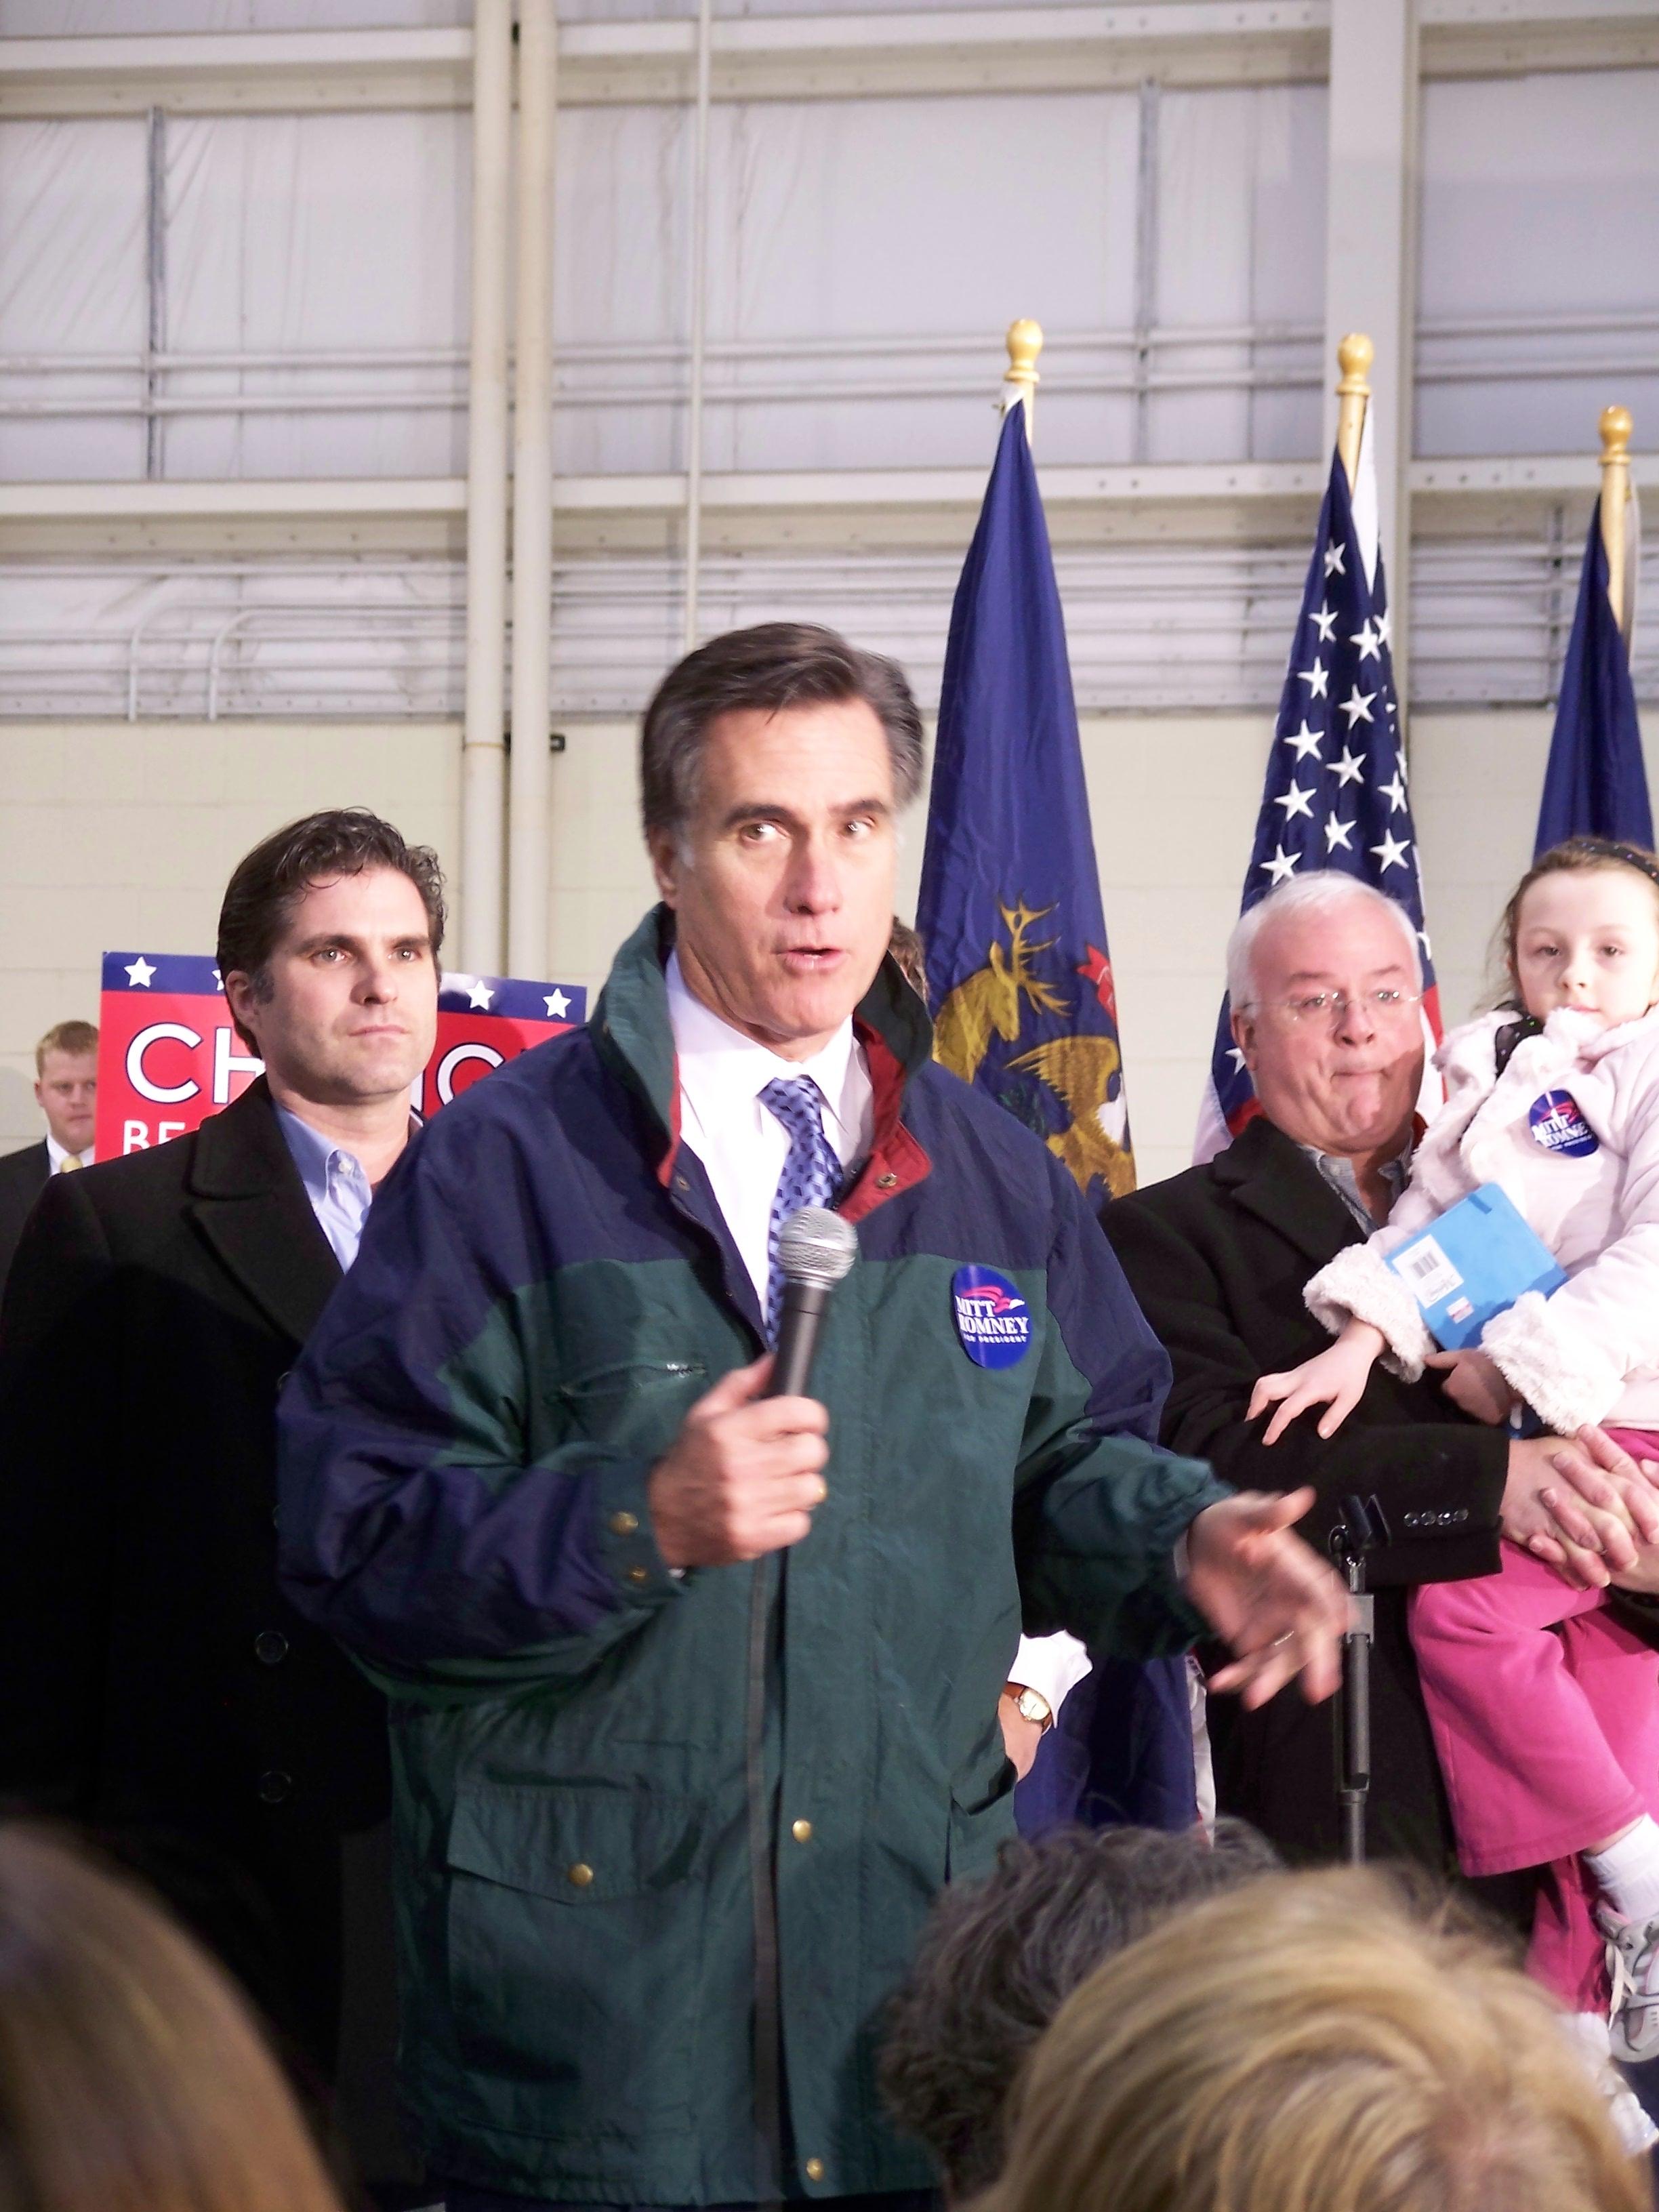 Mitt Romney; GOP; Republican; President; Candidate